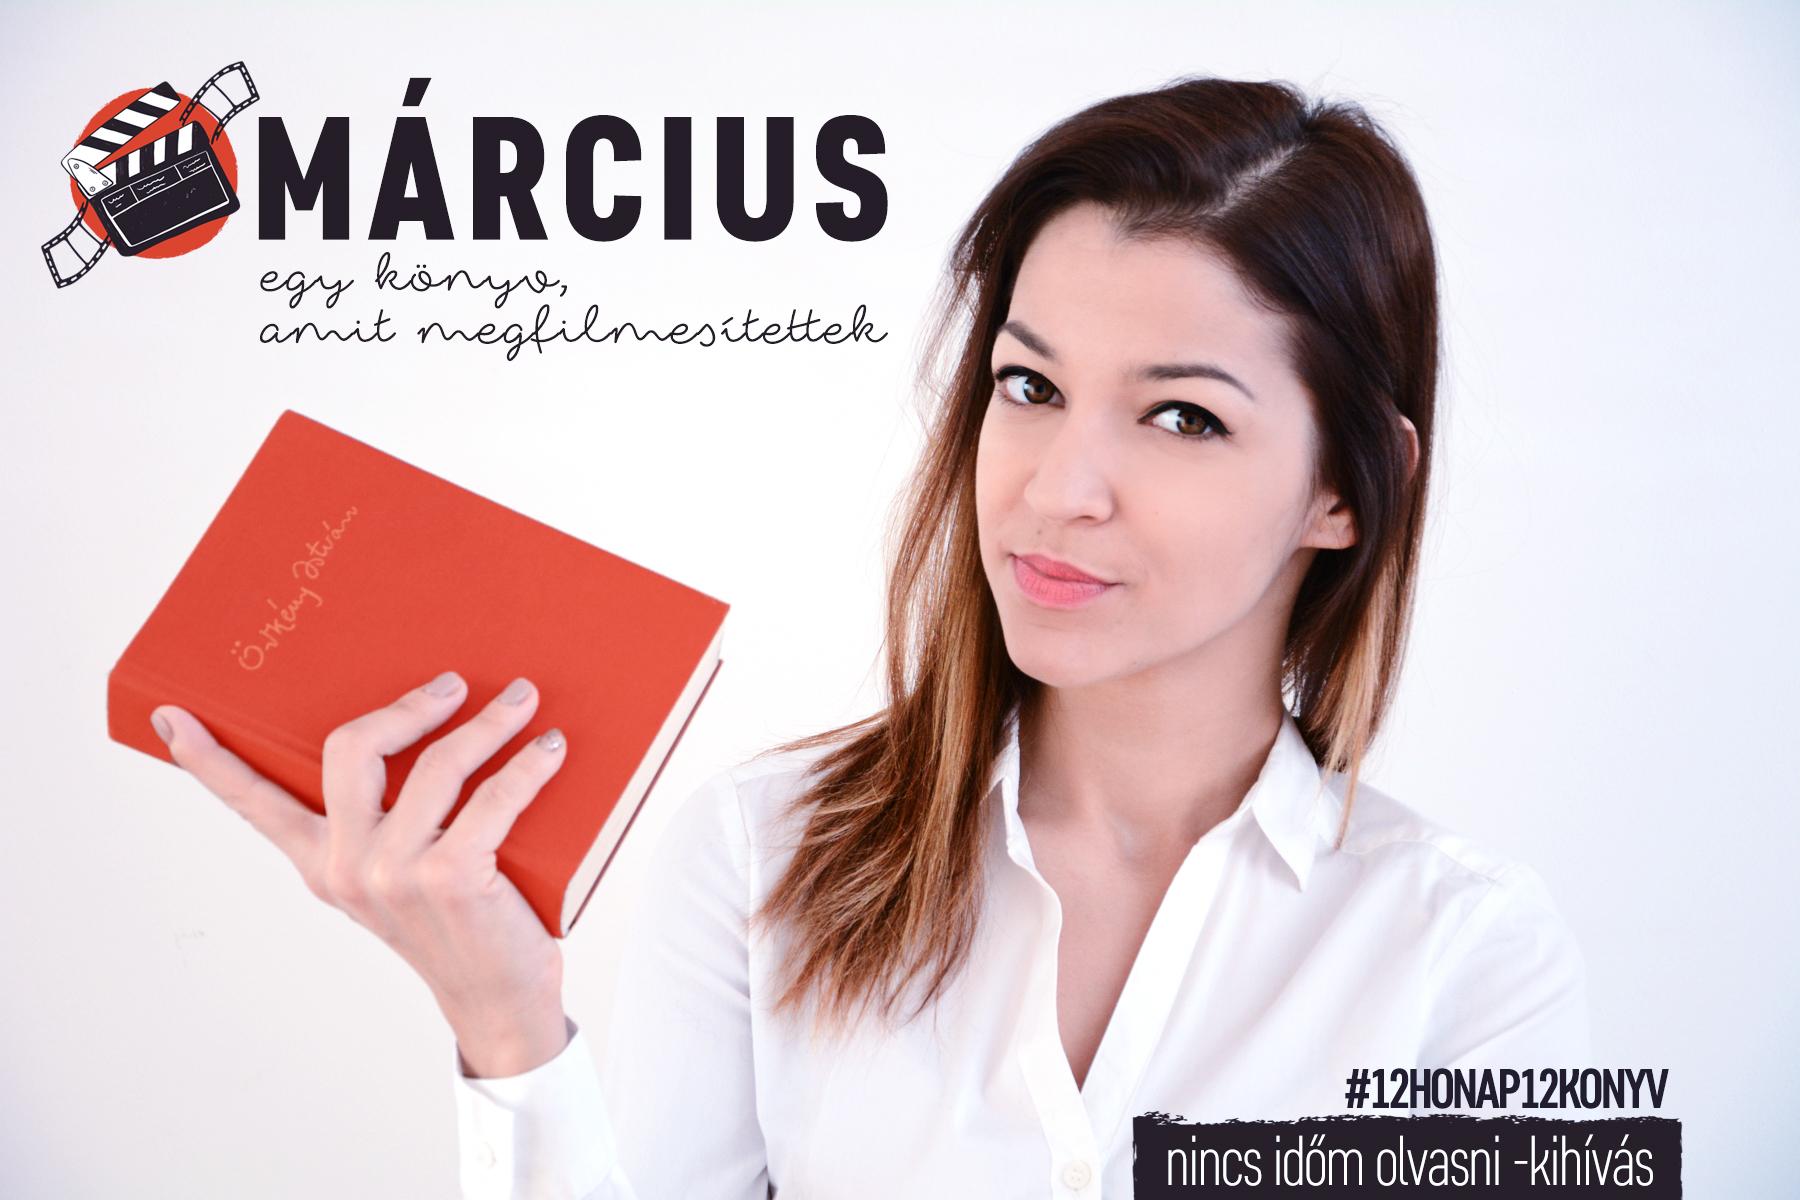 marcius_1.jpg